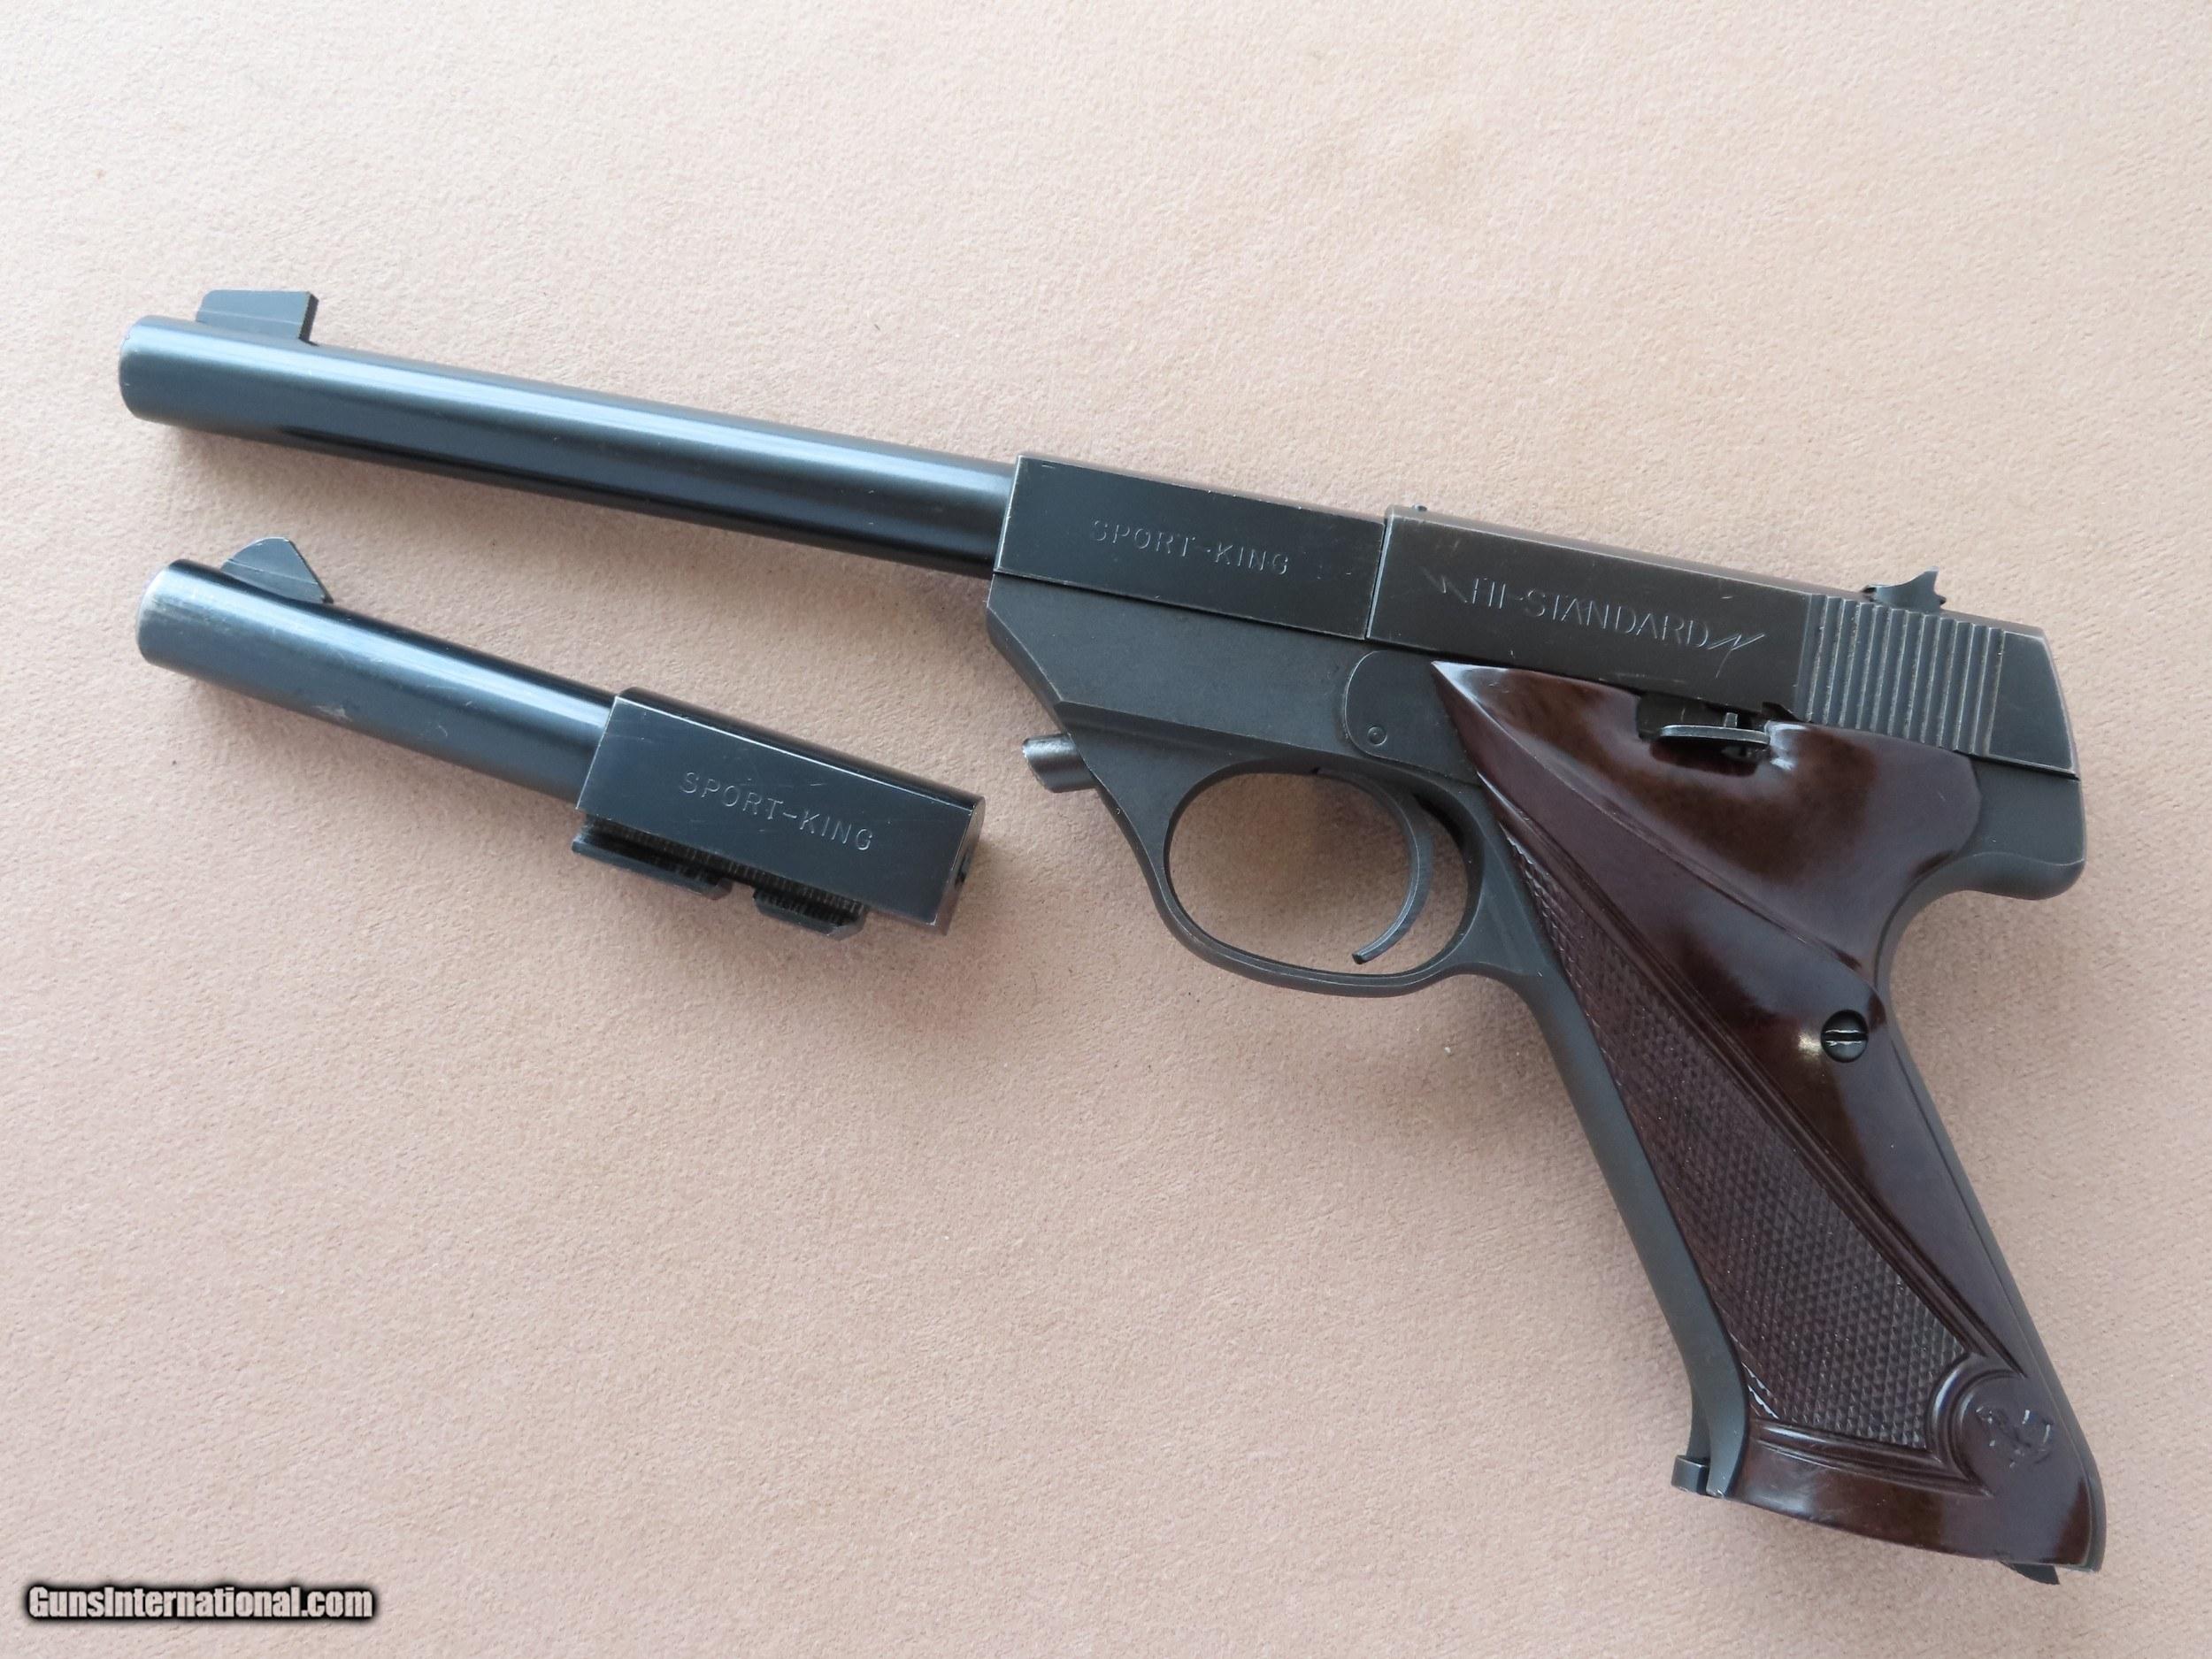 Late 1950s Vintage Hi Standard Sport King 22lr 100 Series Pistol